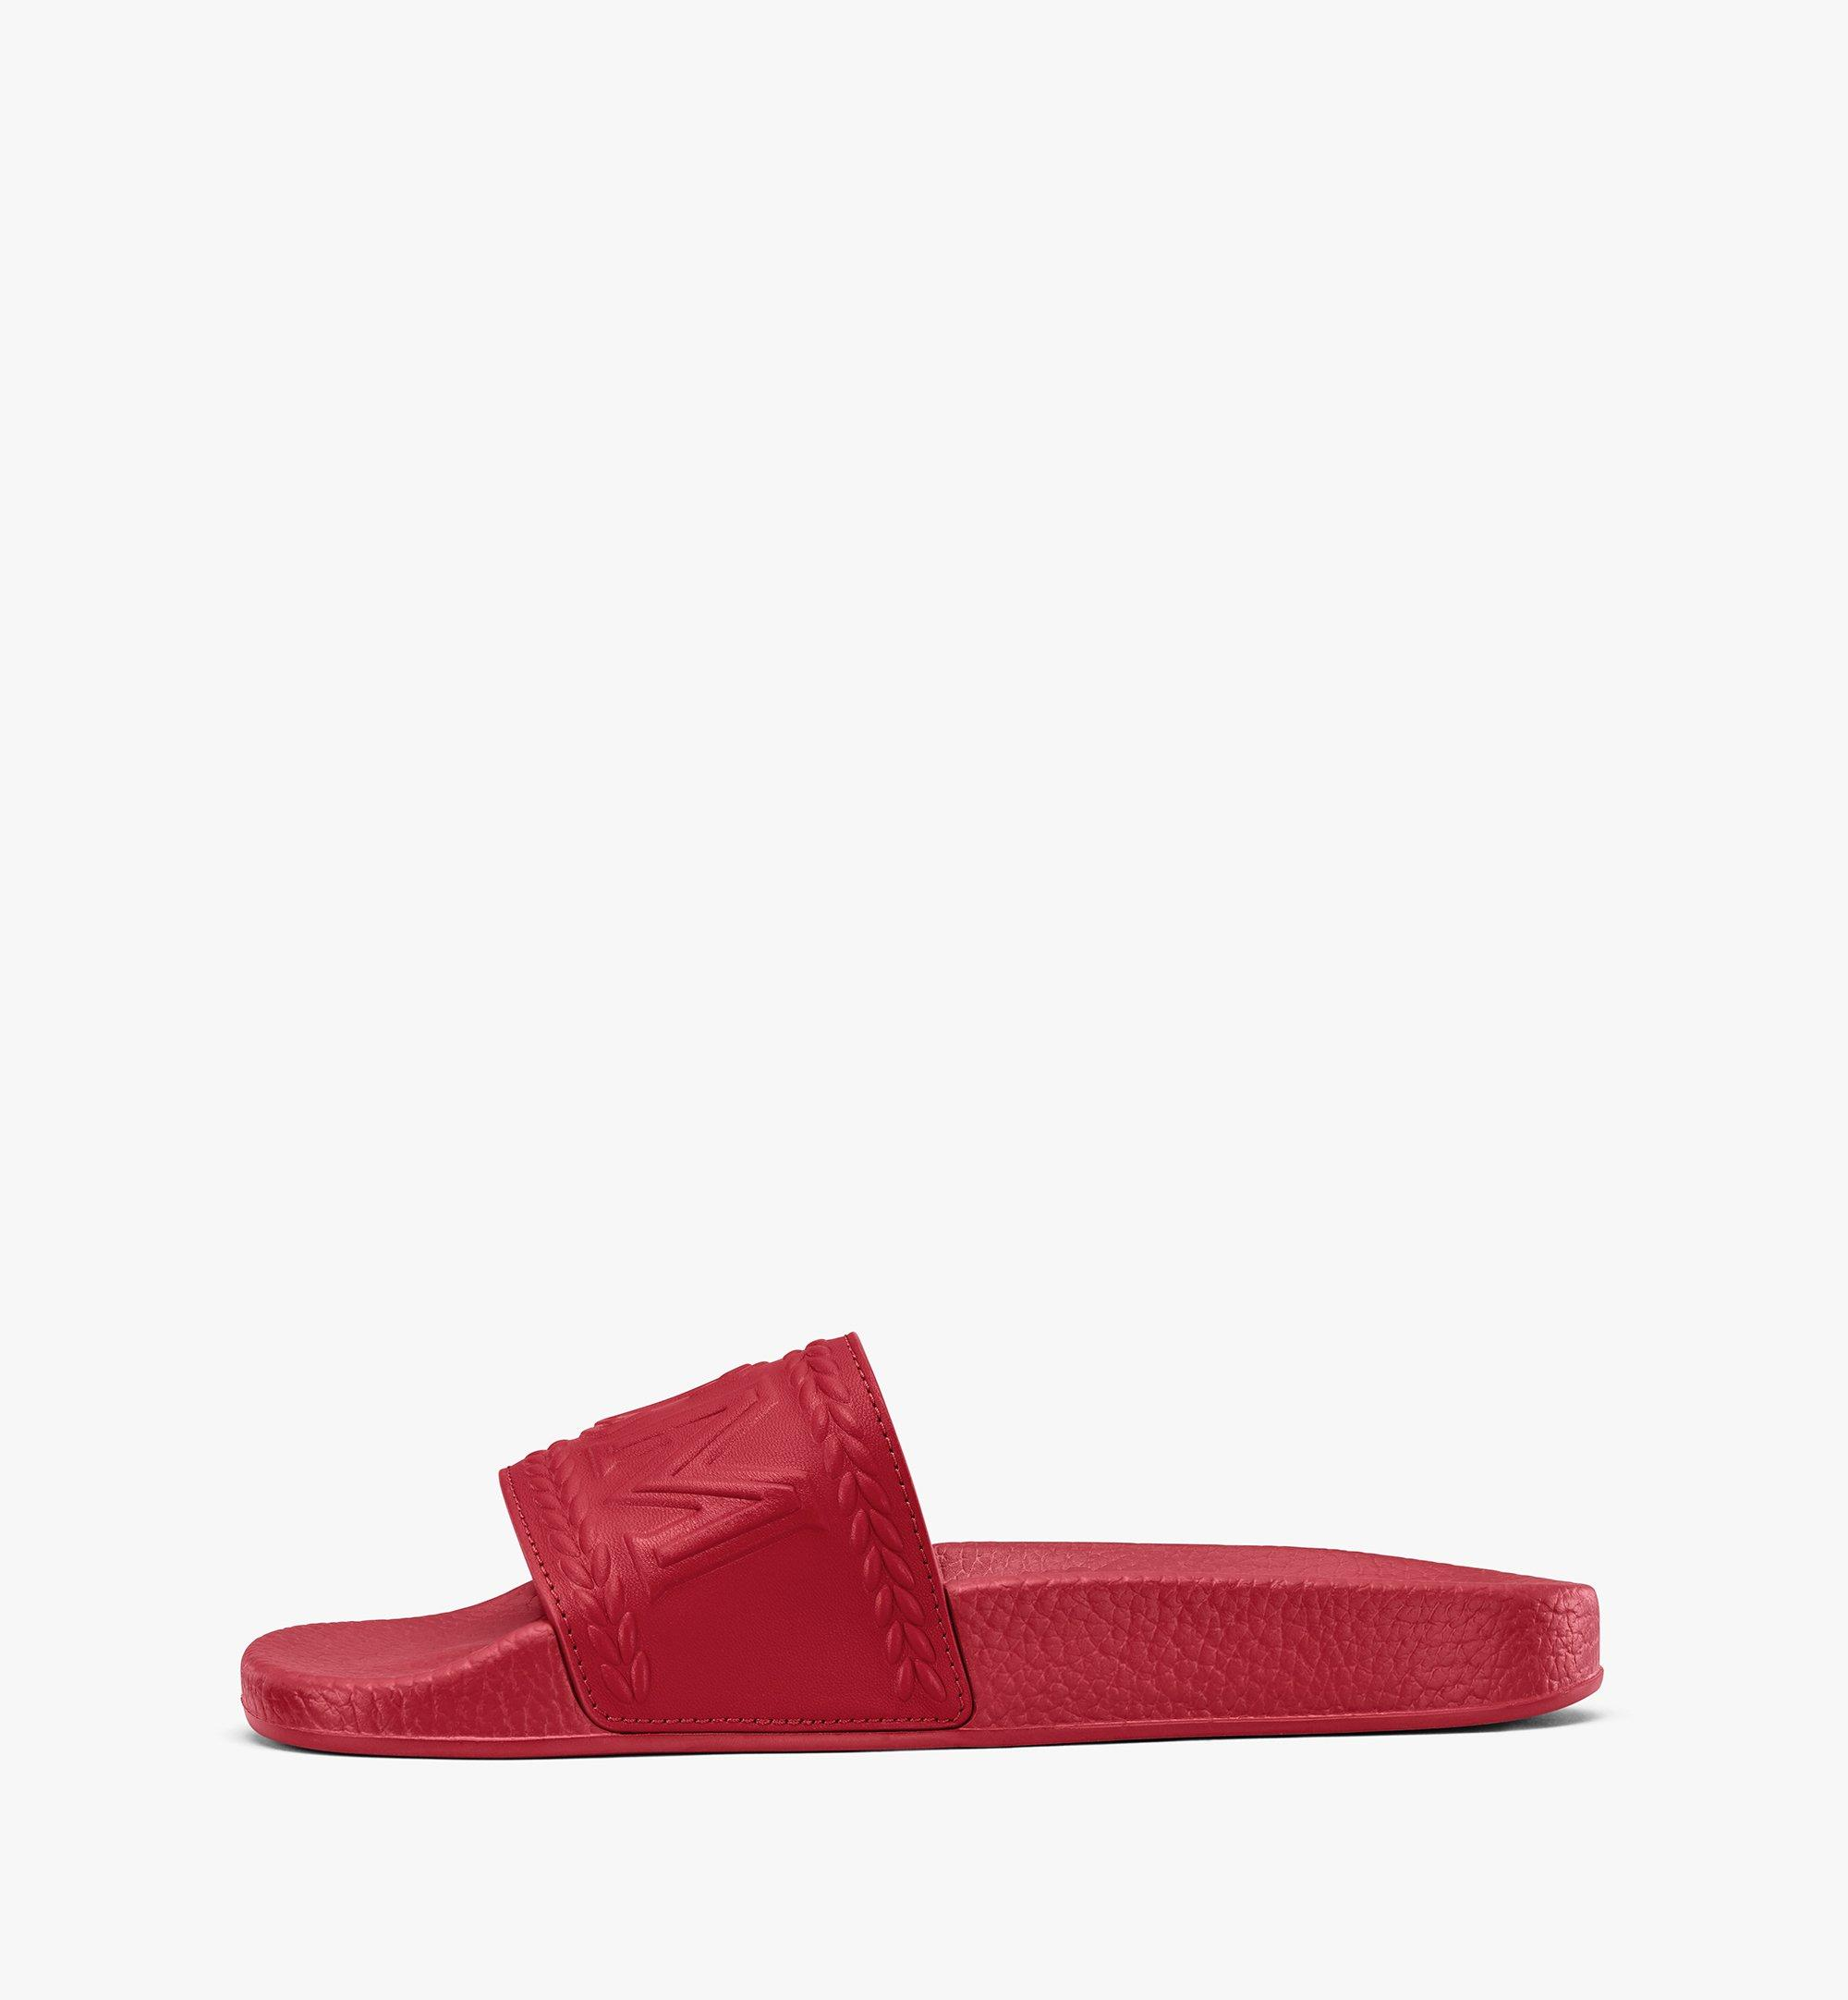 MCM 男士Big Logo拖鞋 Red MEXASMM21R4041 更多视角 3